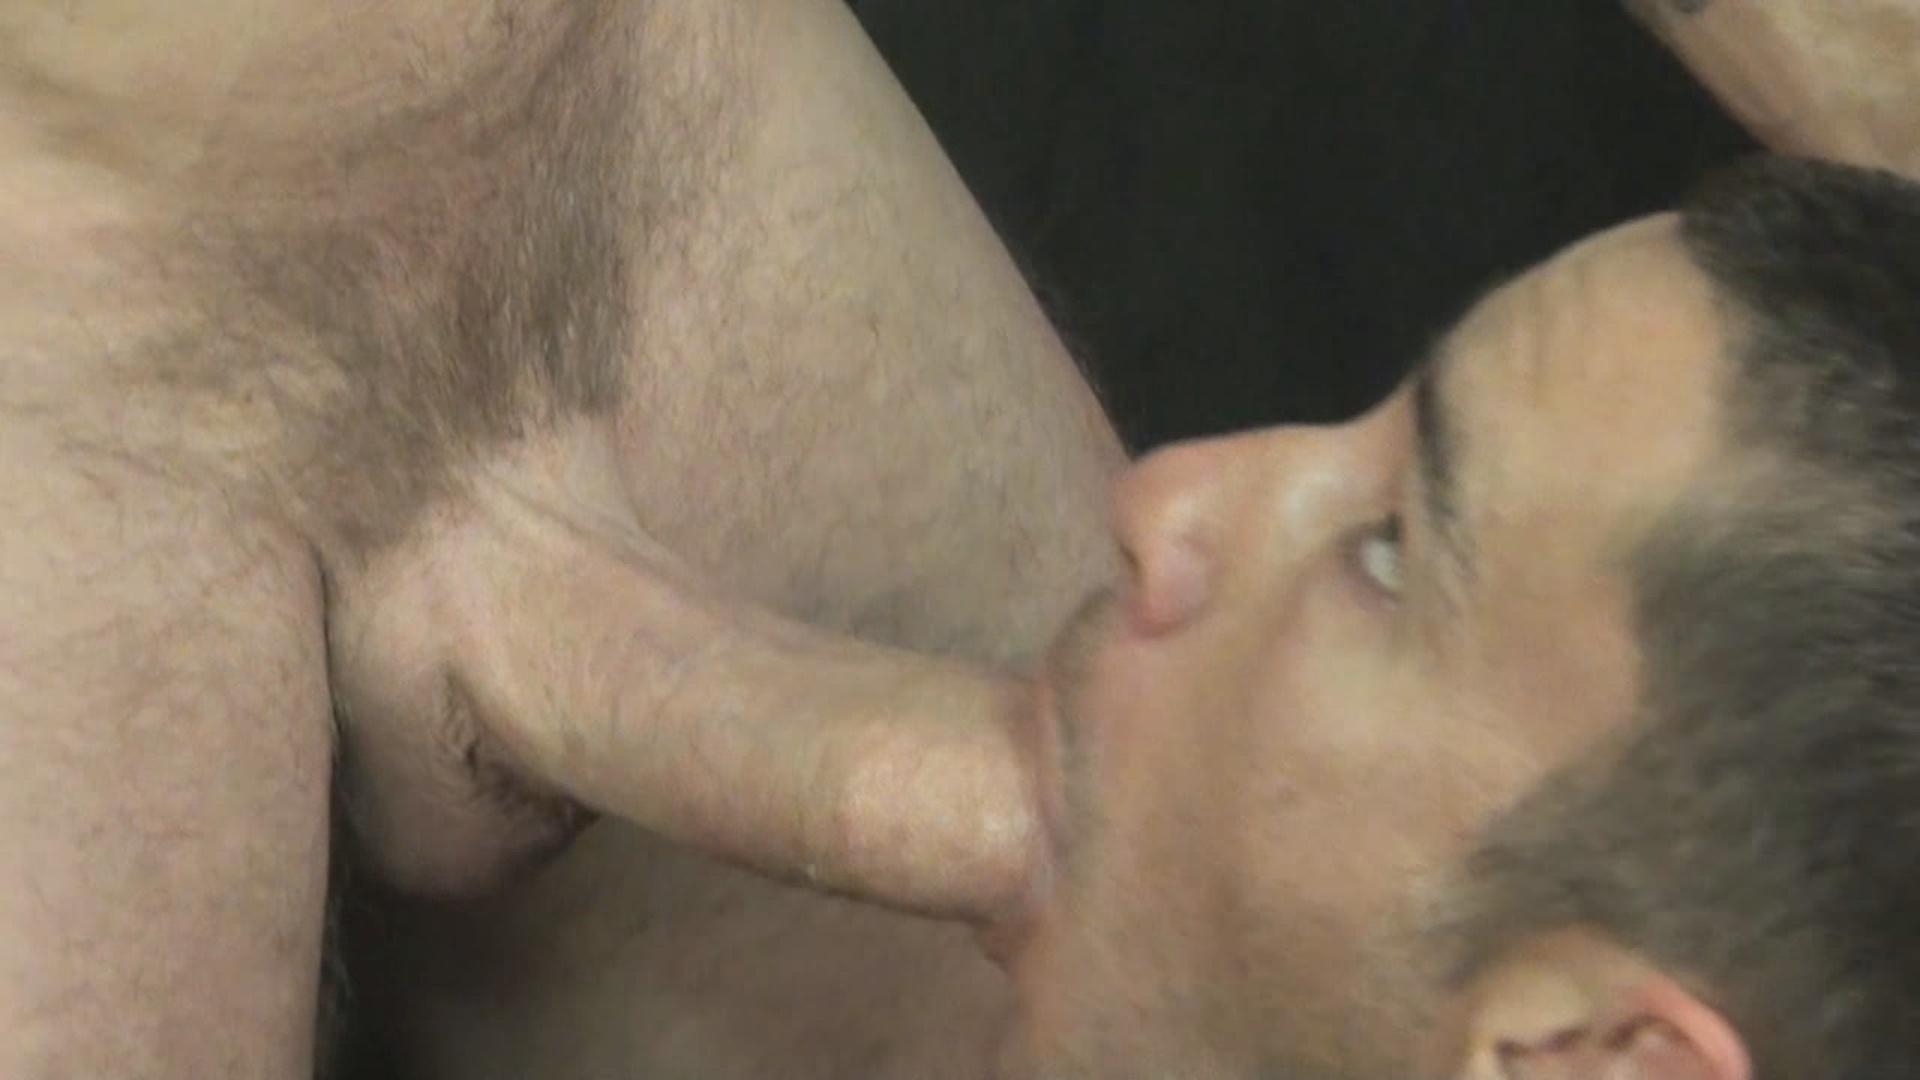 Condom Break 3 Xvideo gay